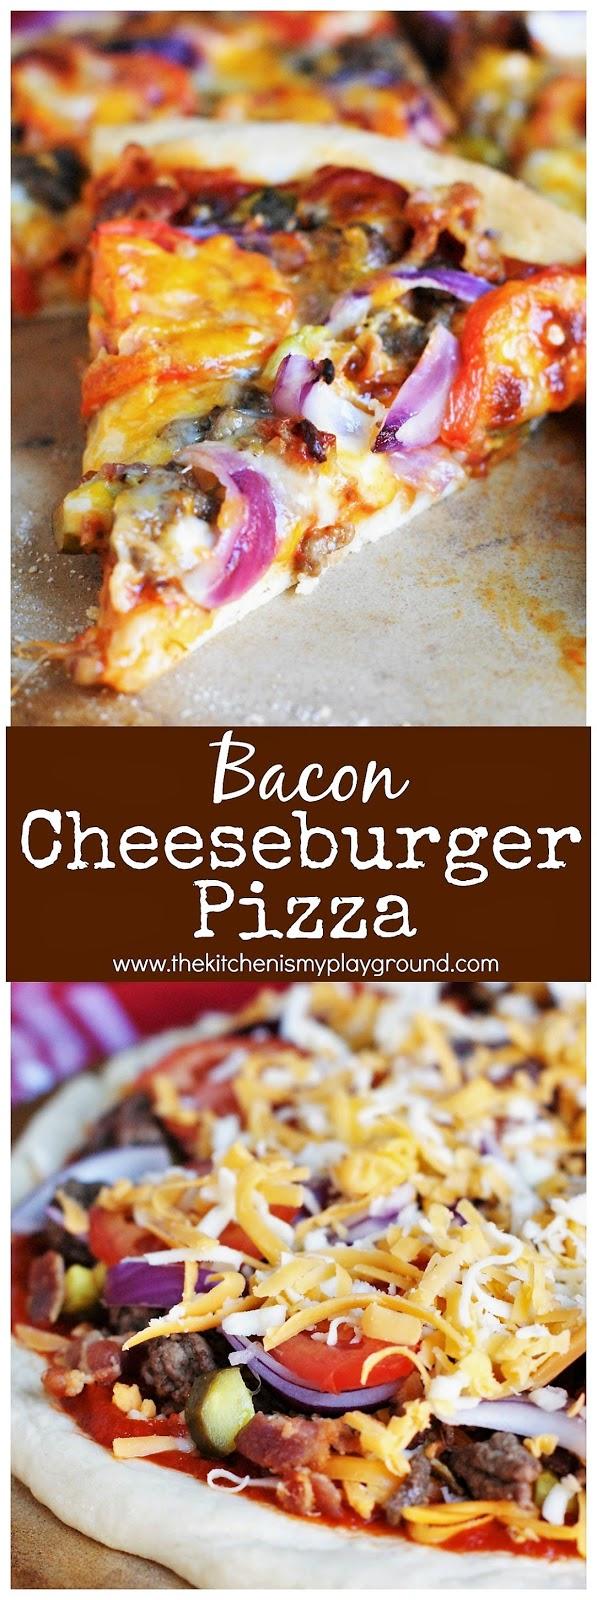 how to make a bacon cheeseburger pizza